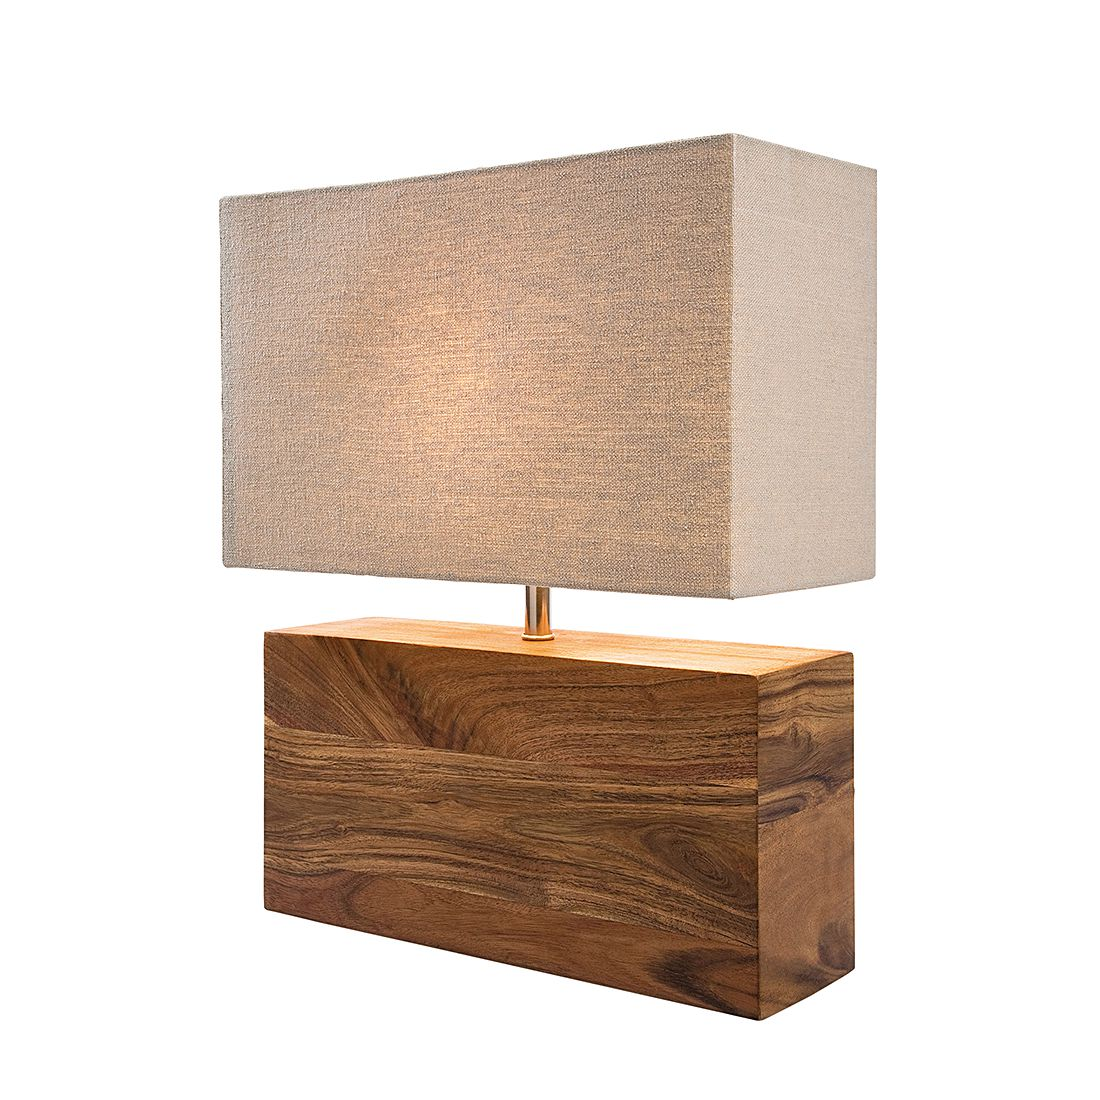 EEK A++, Lampe de table Rectangular Wood Nature - Coton / Bois d'acacia, Kare Design